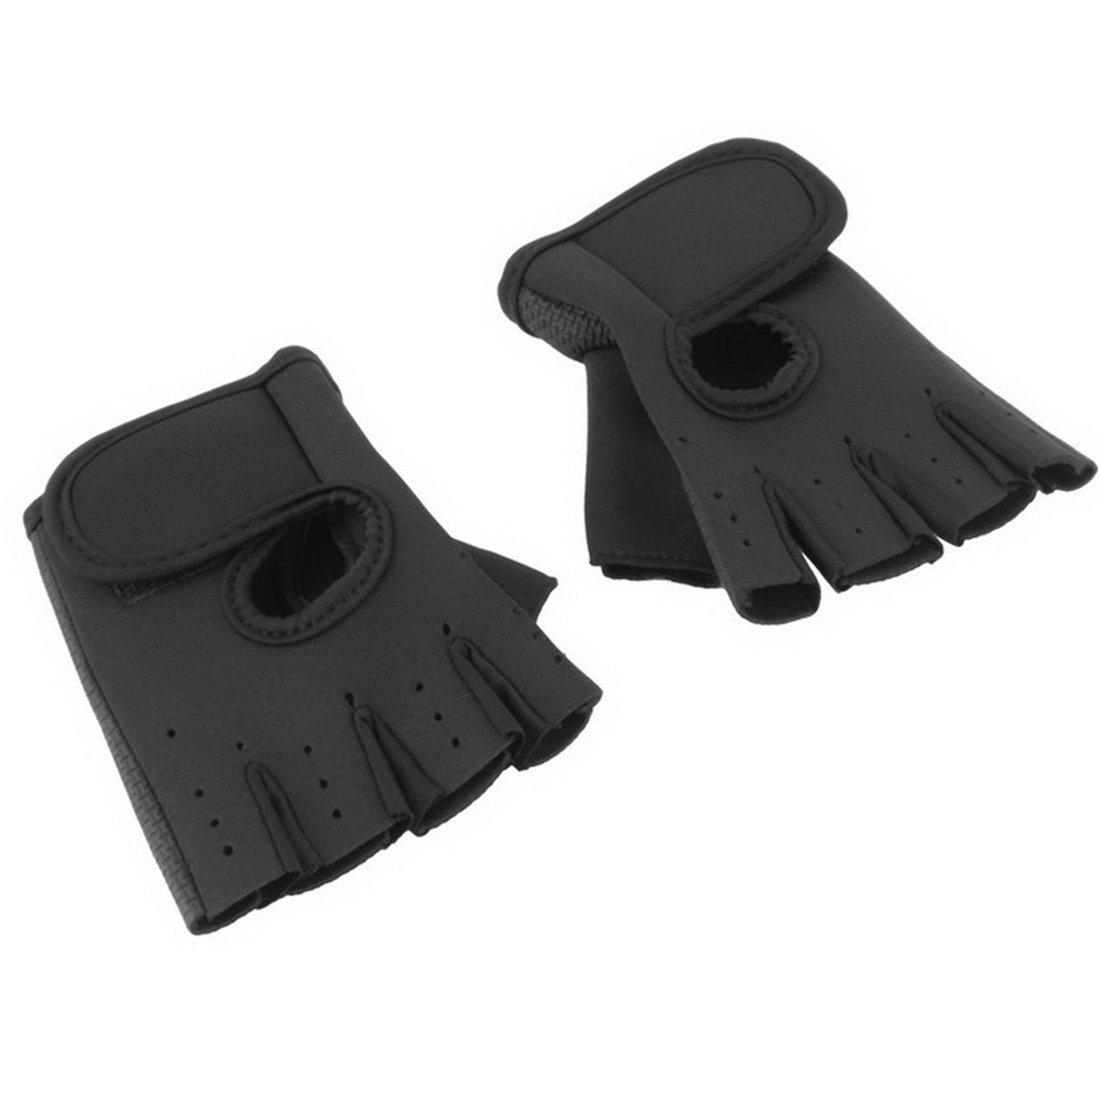 1Pair Sports Gloves Fitness Exercise Training Gym Gloves-Black M Luwu-Store